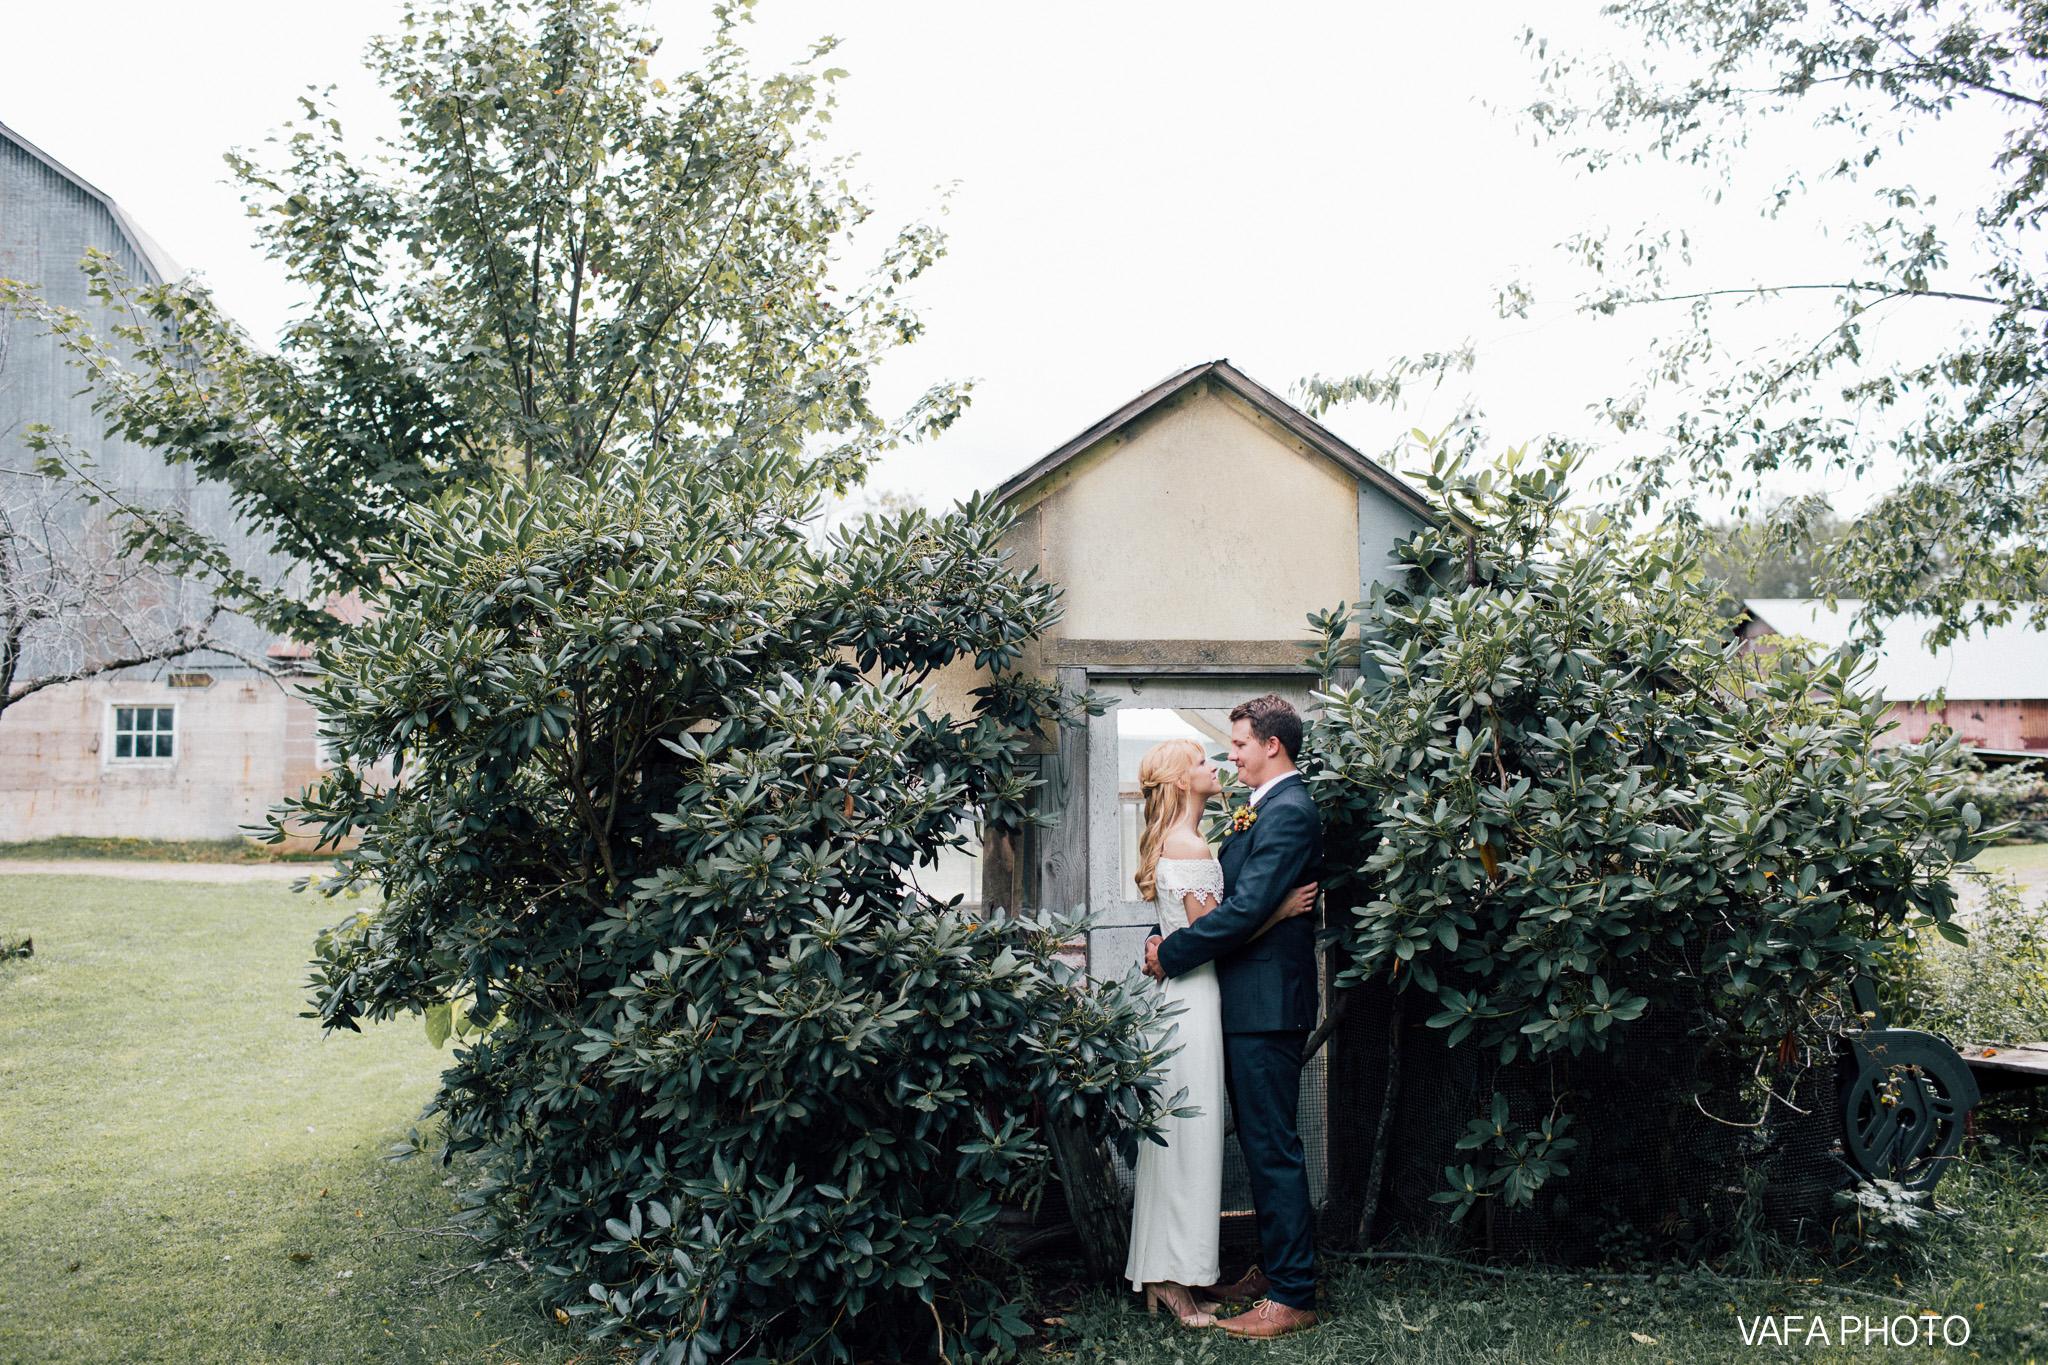 Belsolda-Farm-Wedding-Christy-Eric-Vafa-Photo-181.jpg